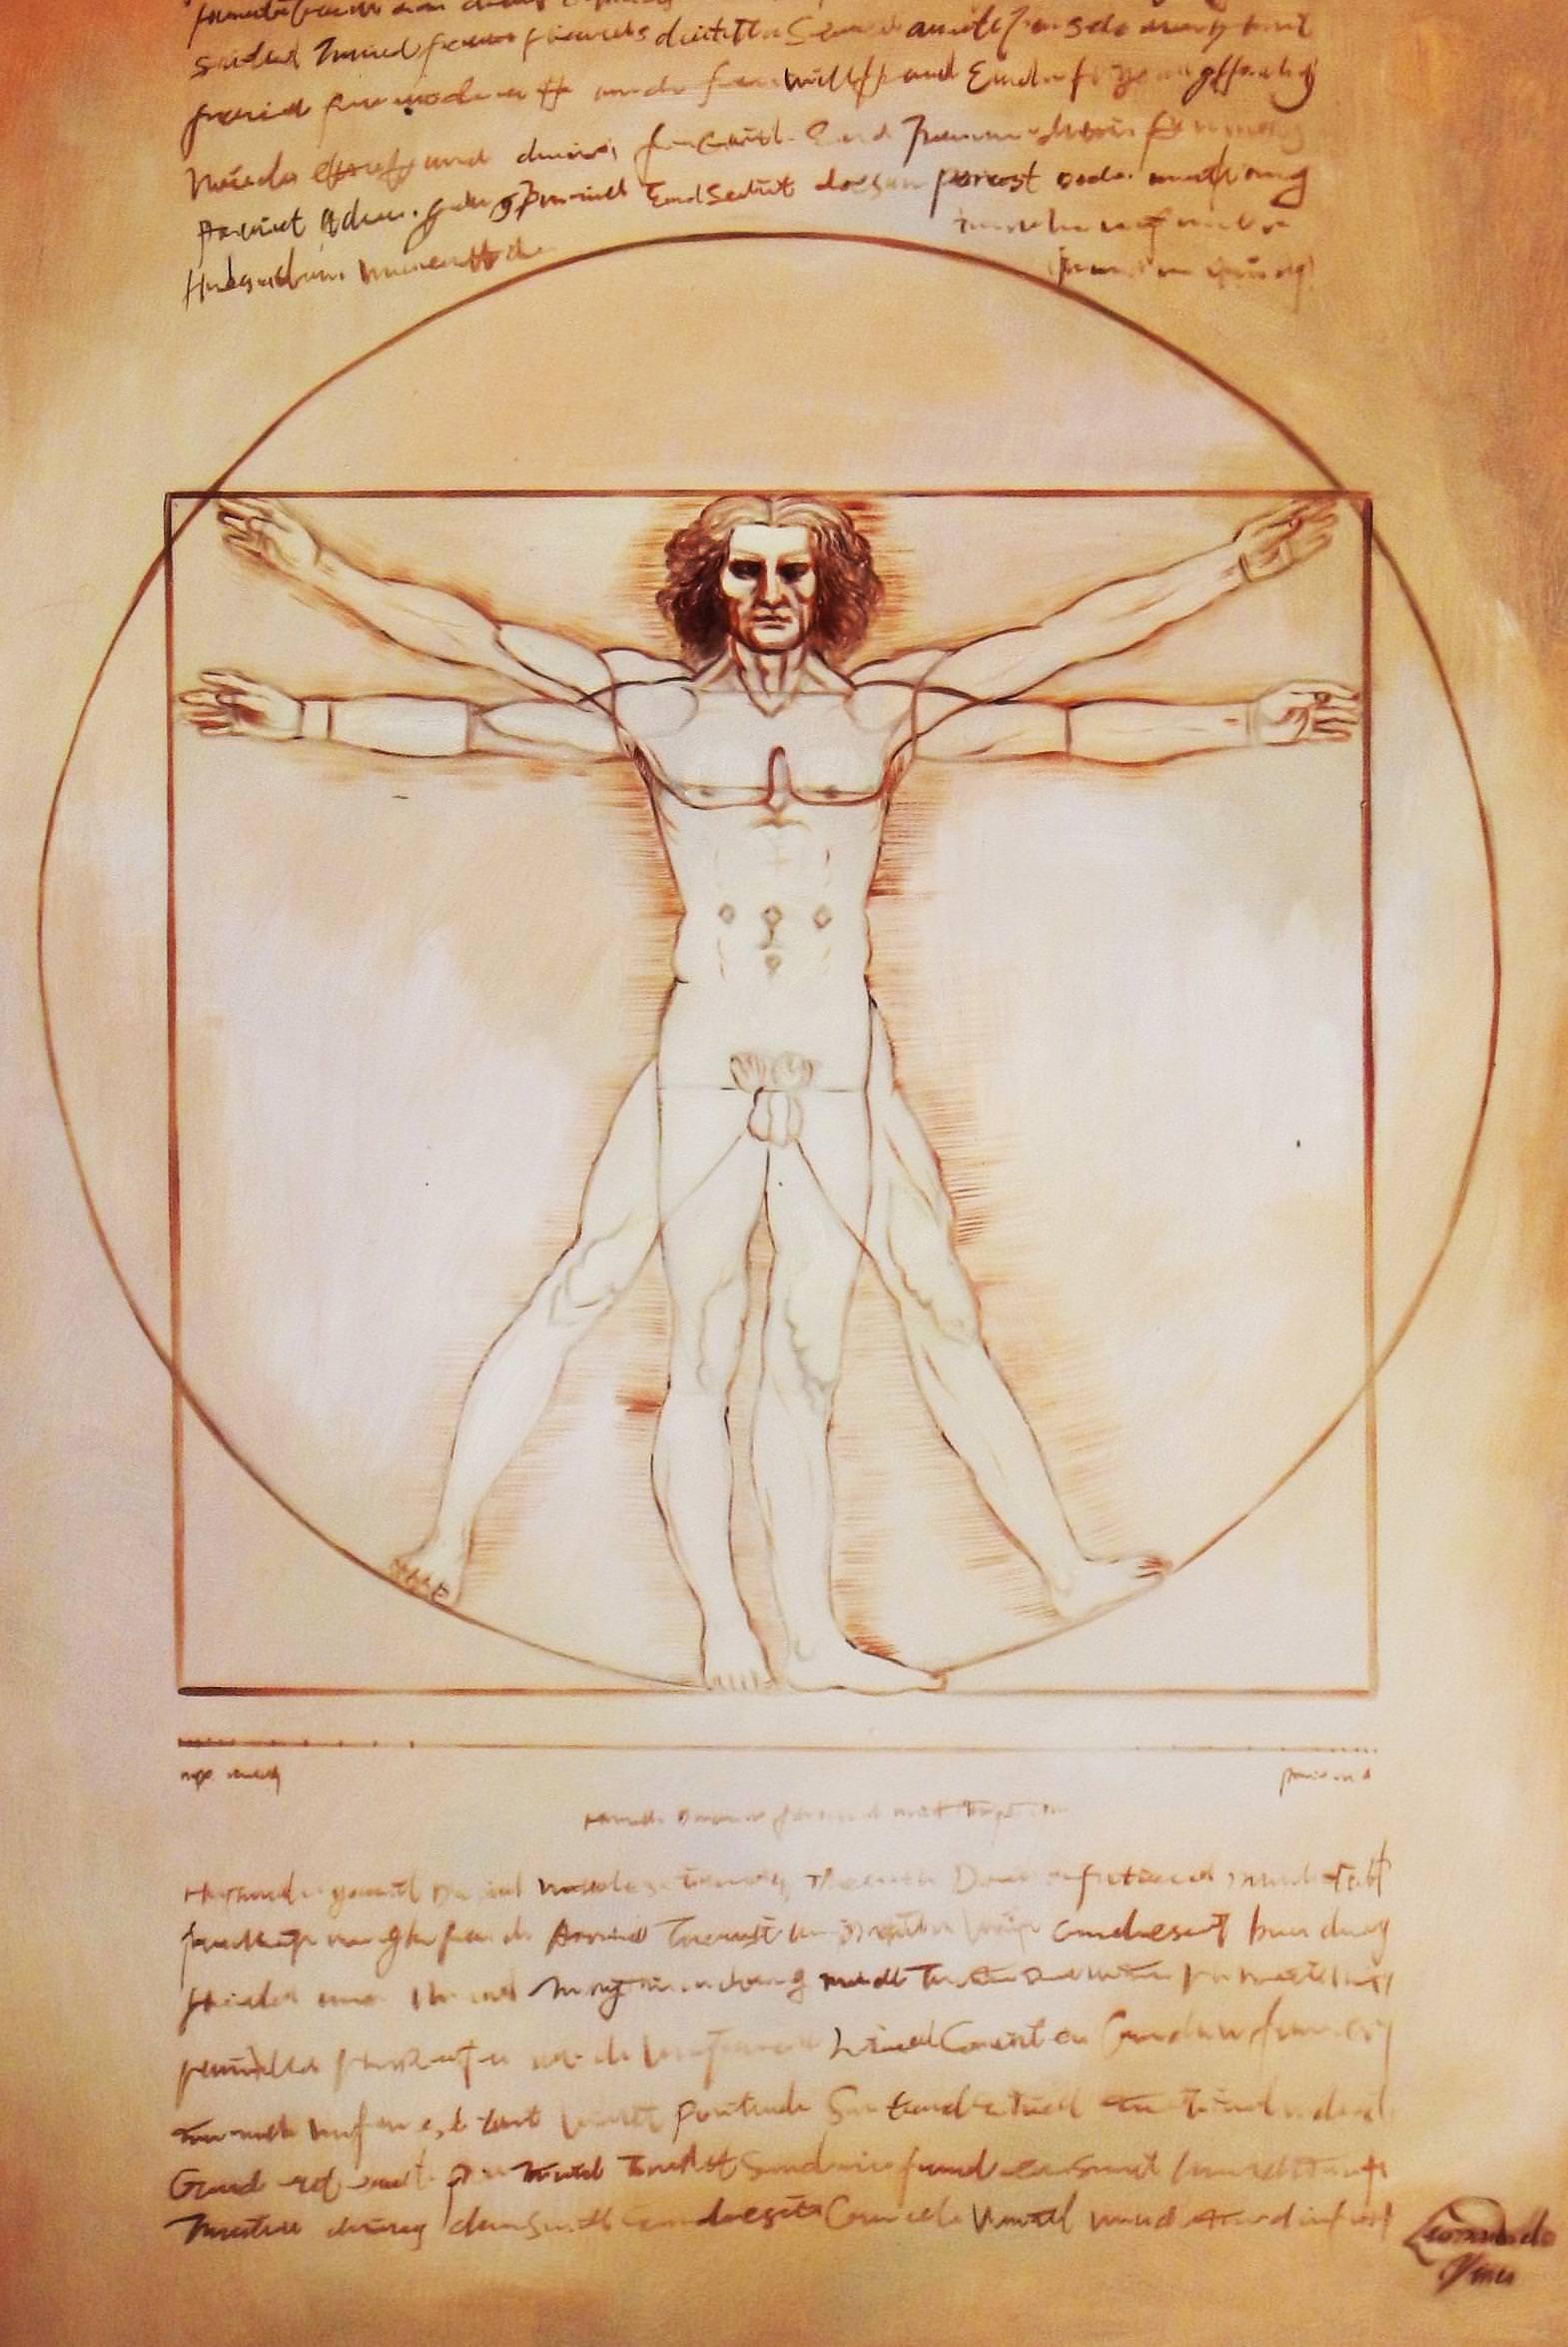 Leonardo da Vinci - Proportionsstudie d93959 60x90cm handgemaltes Ölgemälde